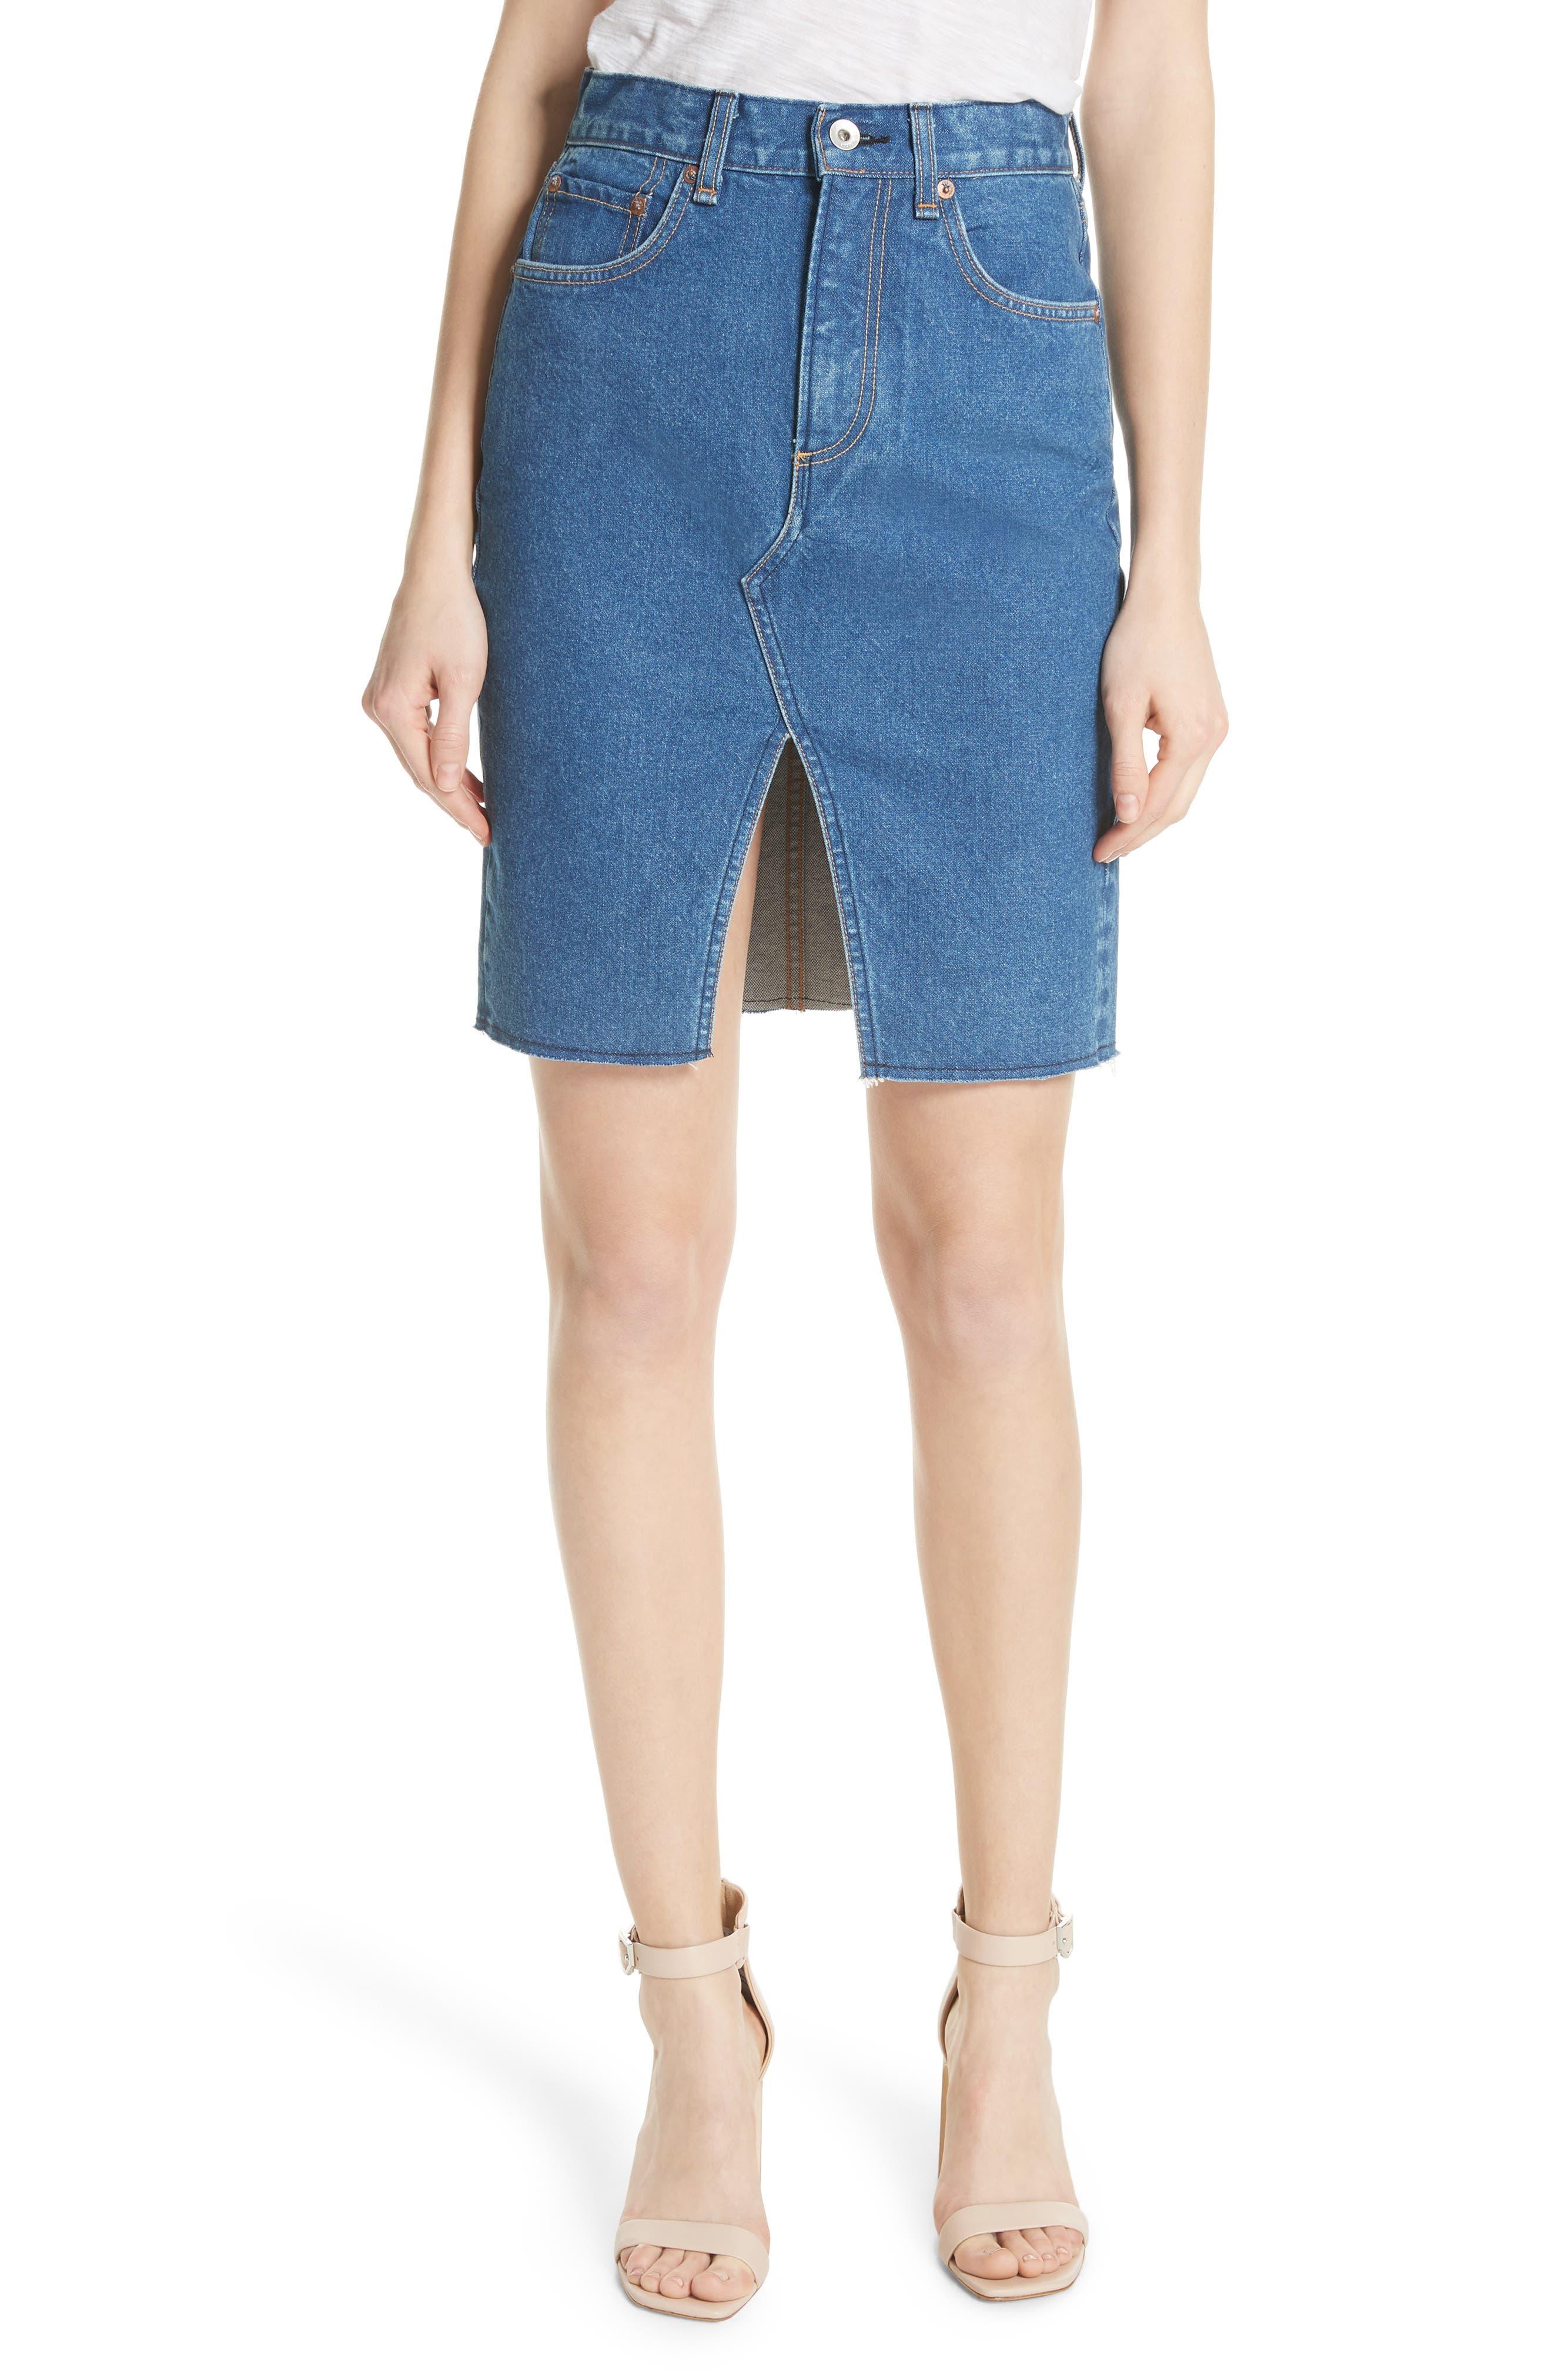 Suji Denim Skirt,                             Main thumbnail 1, color,                             401